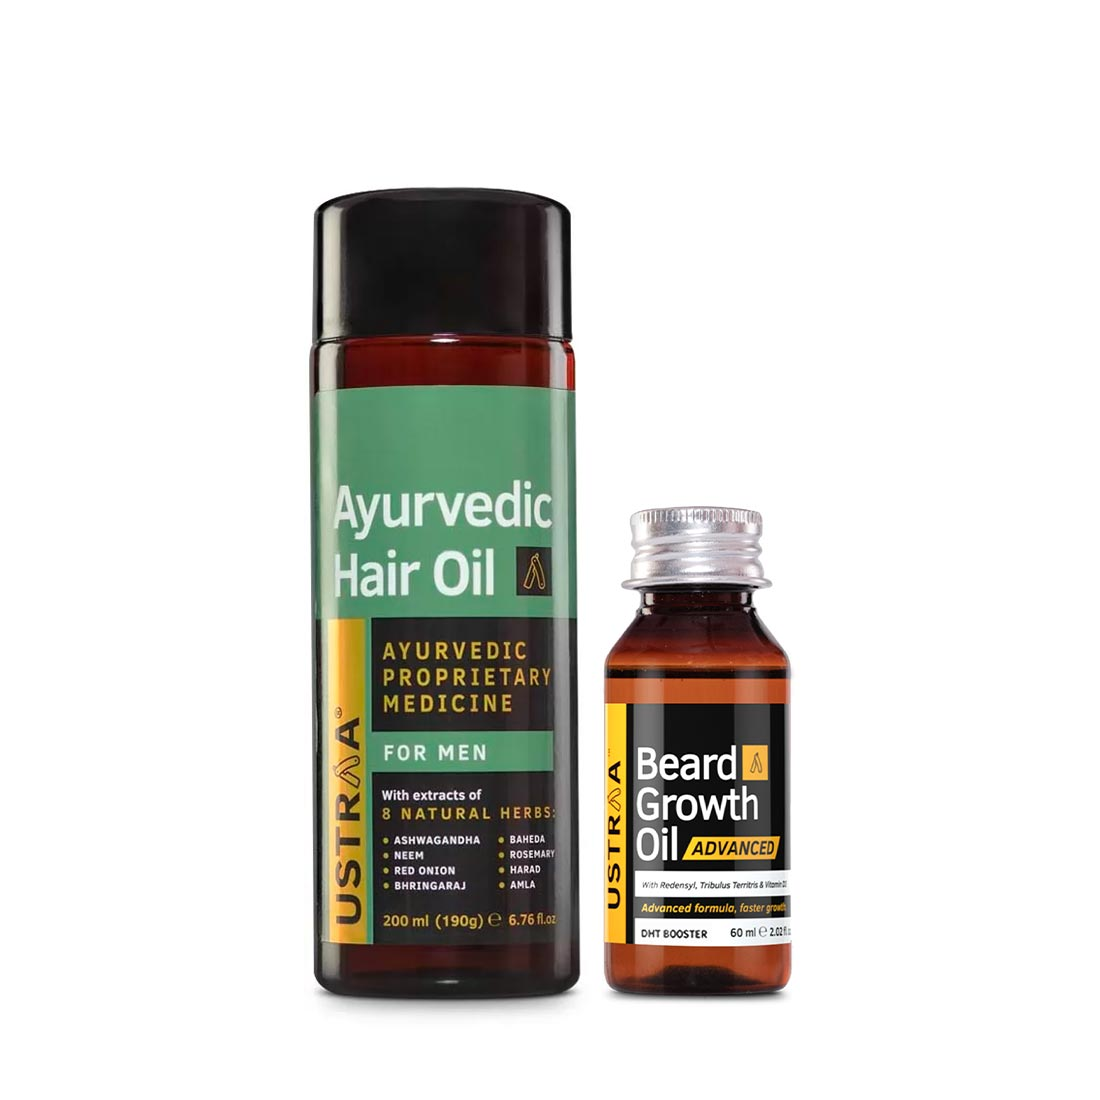 Ustraa | Ustraa Ayurvedic Hair Oil 200 ml and Beard Growth Oil Advanced 60 ml